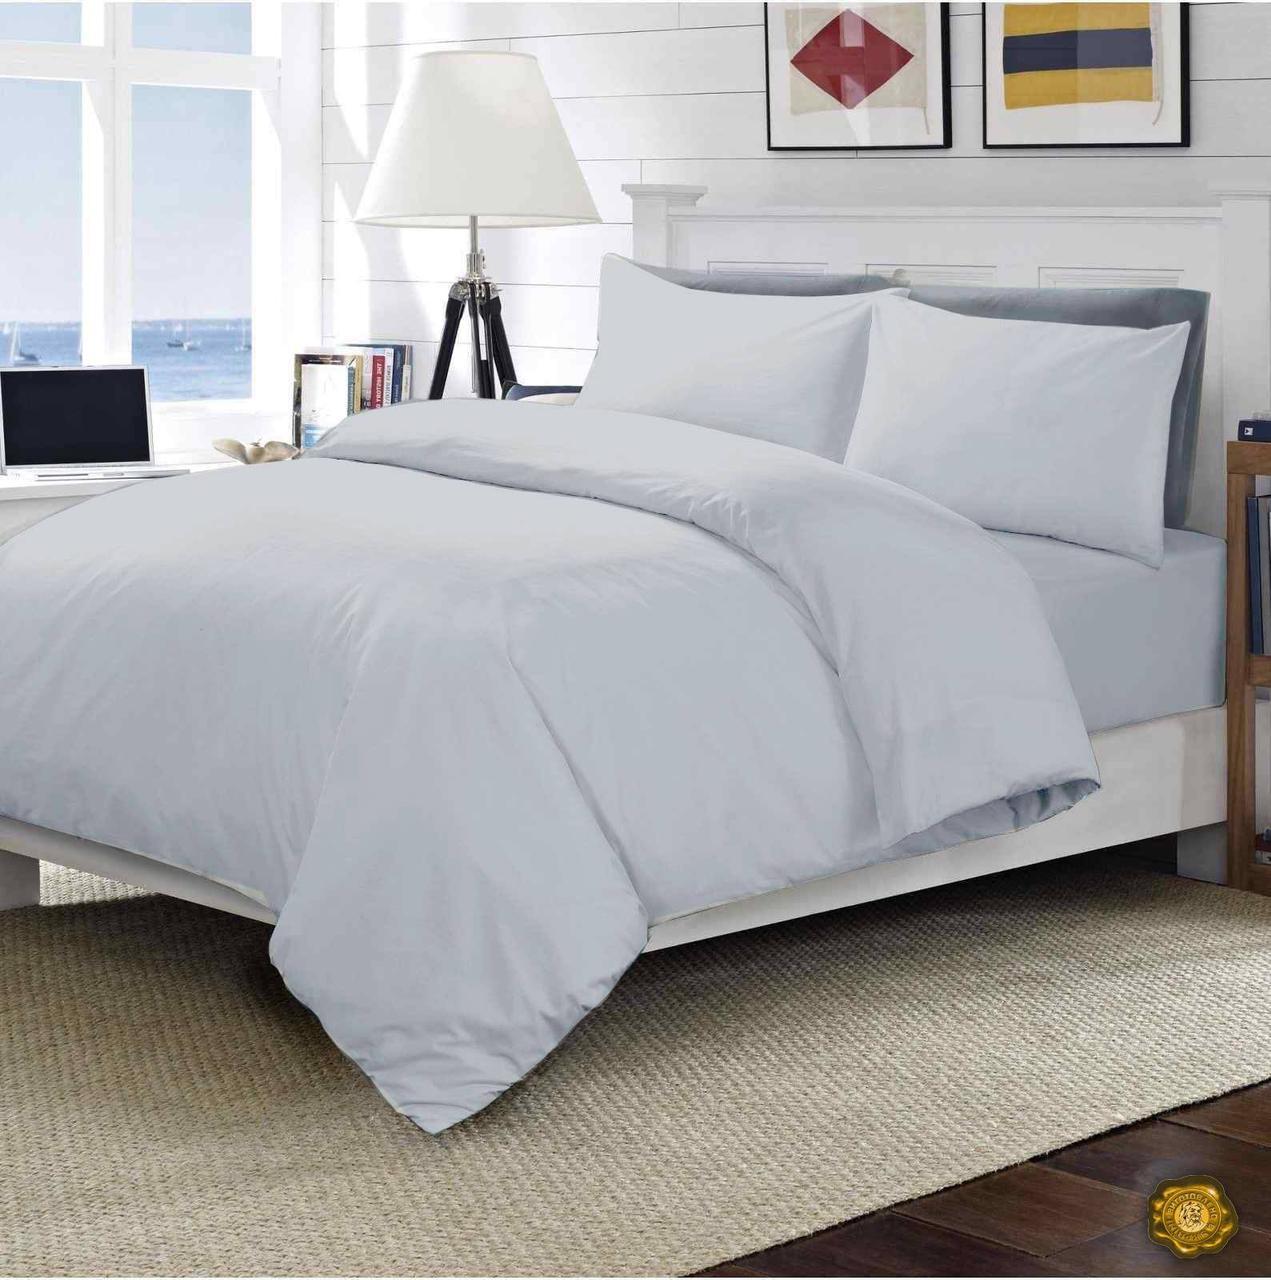 Комплект постельного белья Евро, Микрофибра (2-х сп.ЕМІ0008)